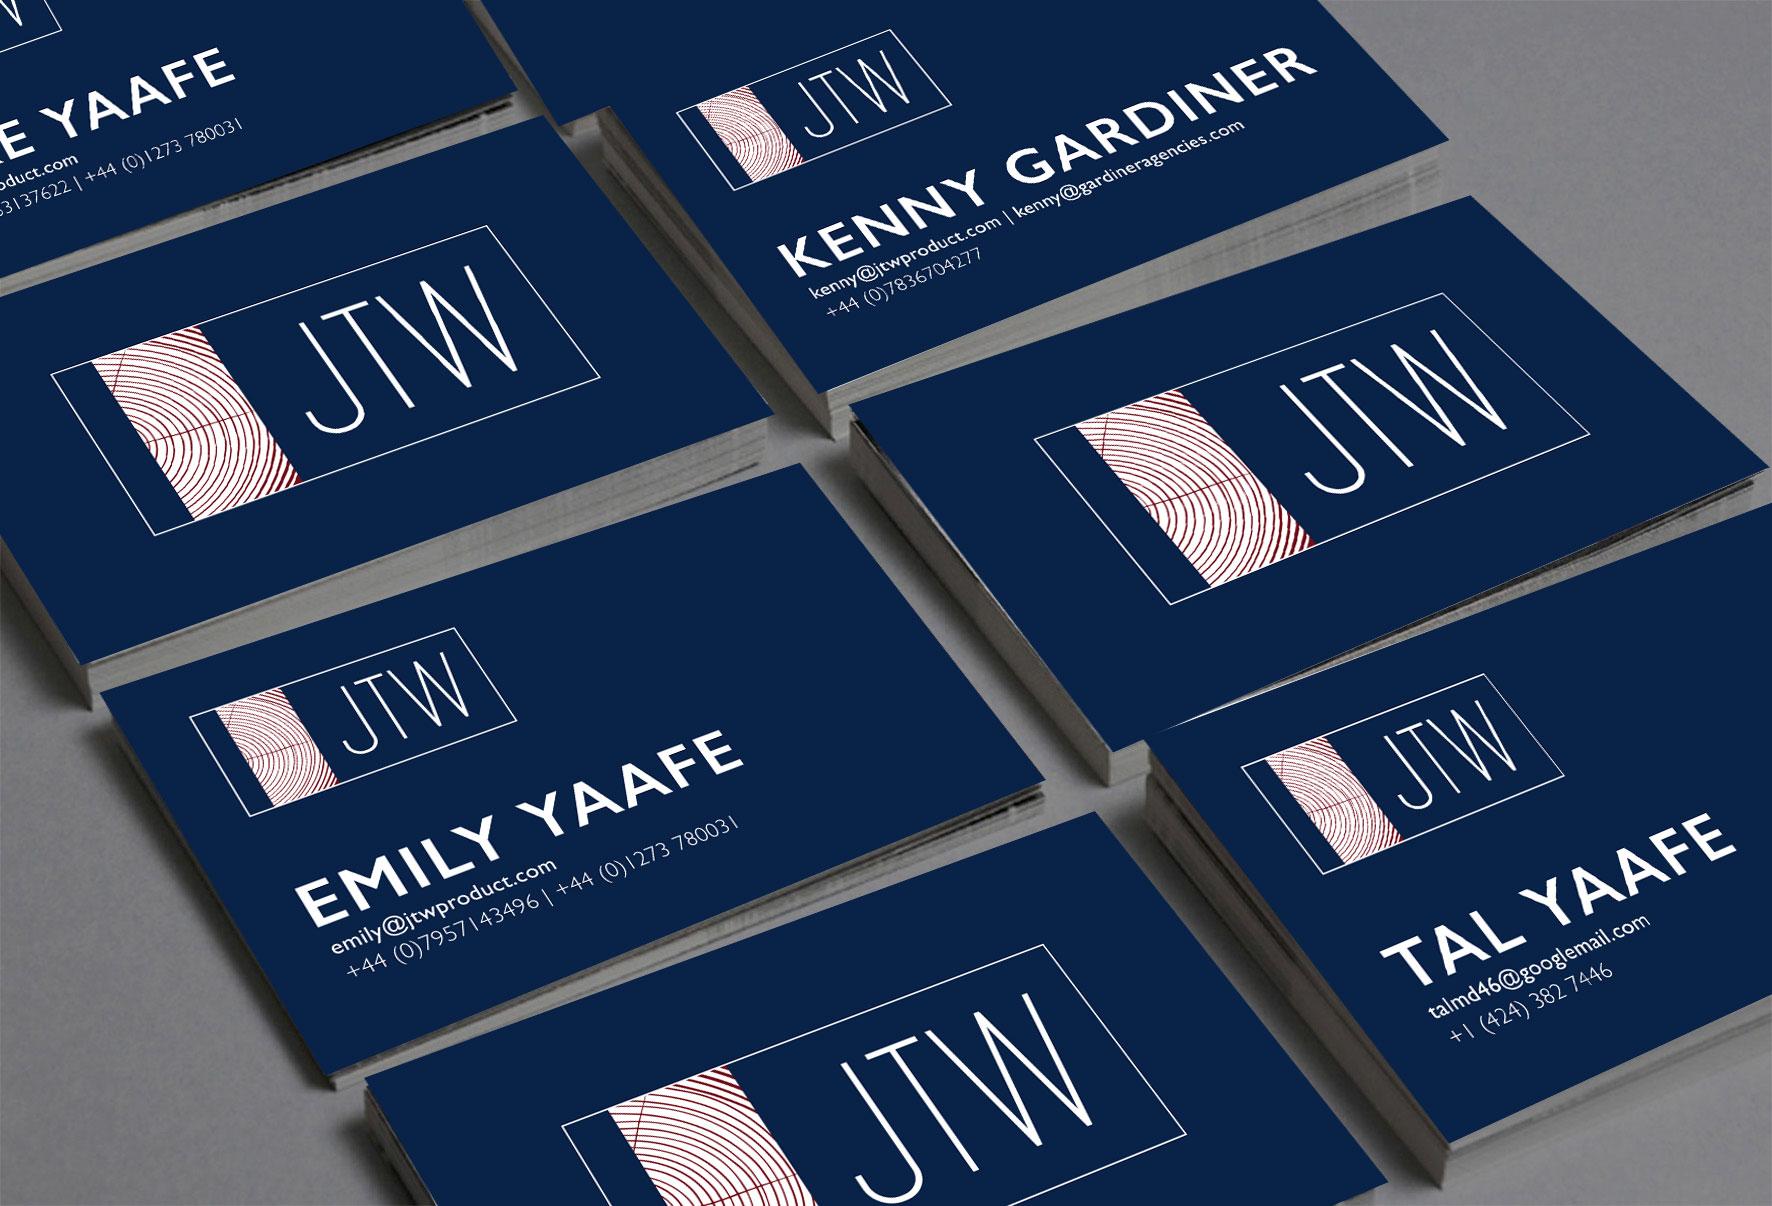 JTW Company Business Card Design